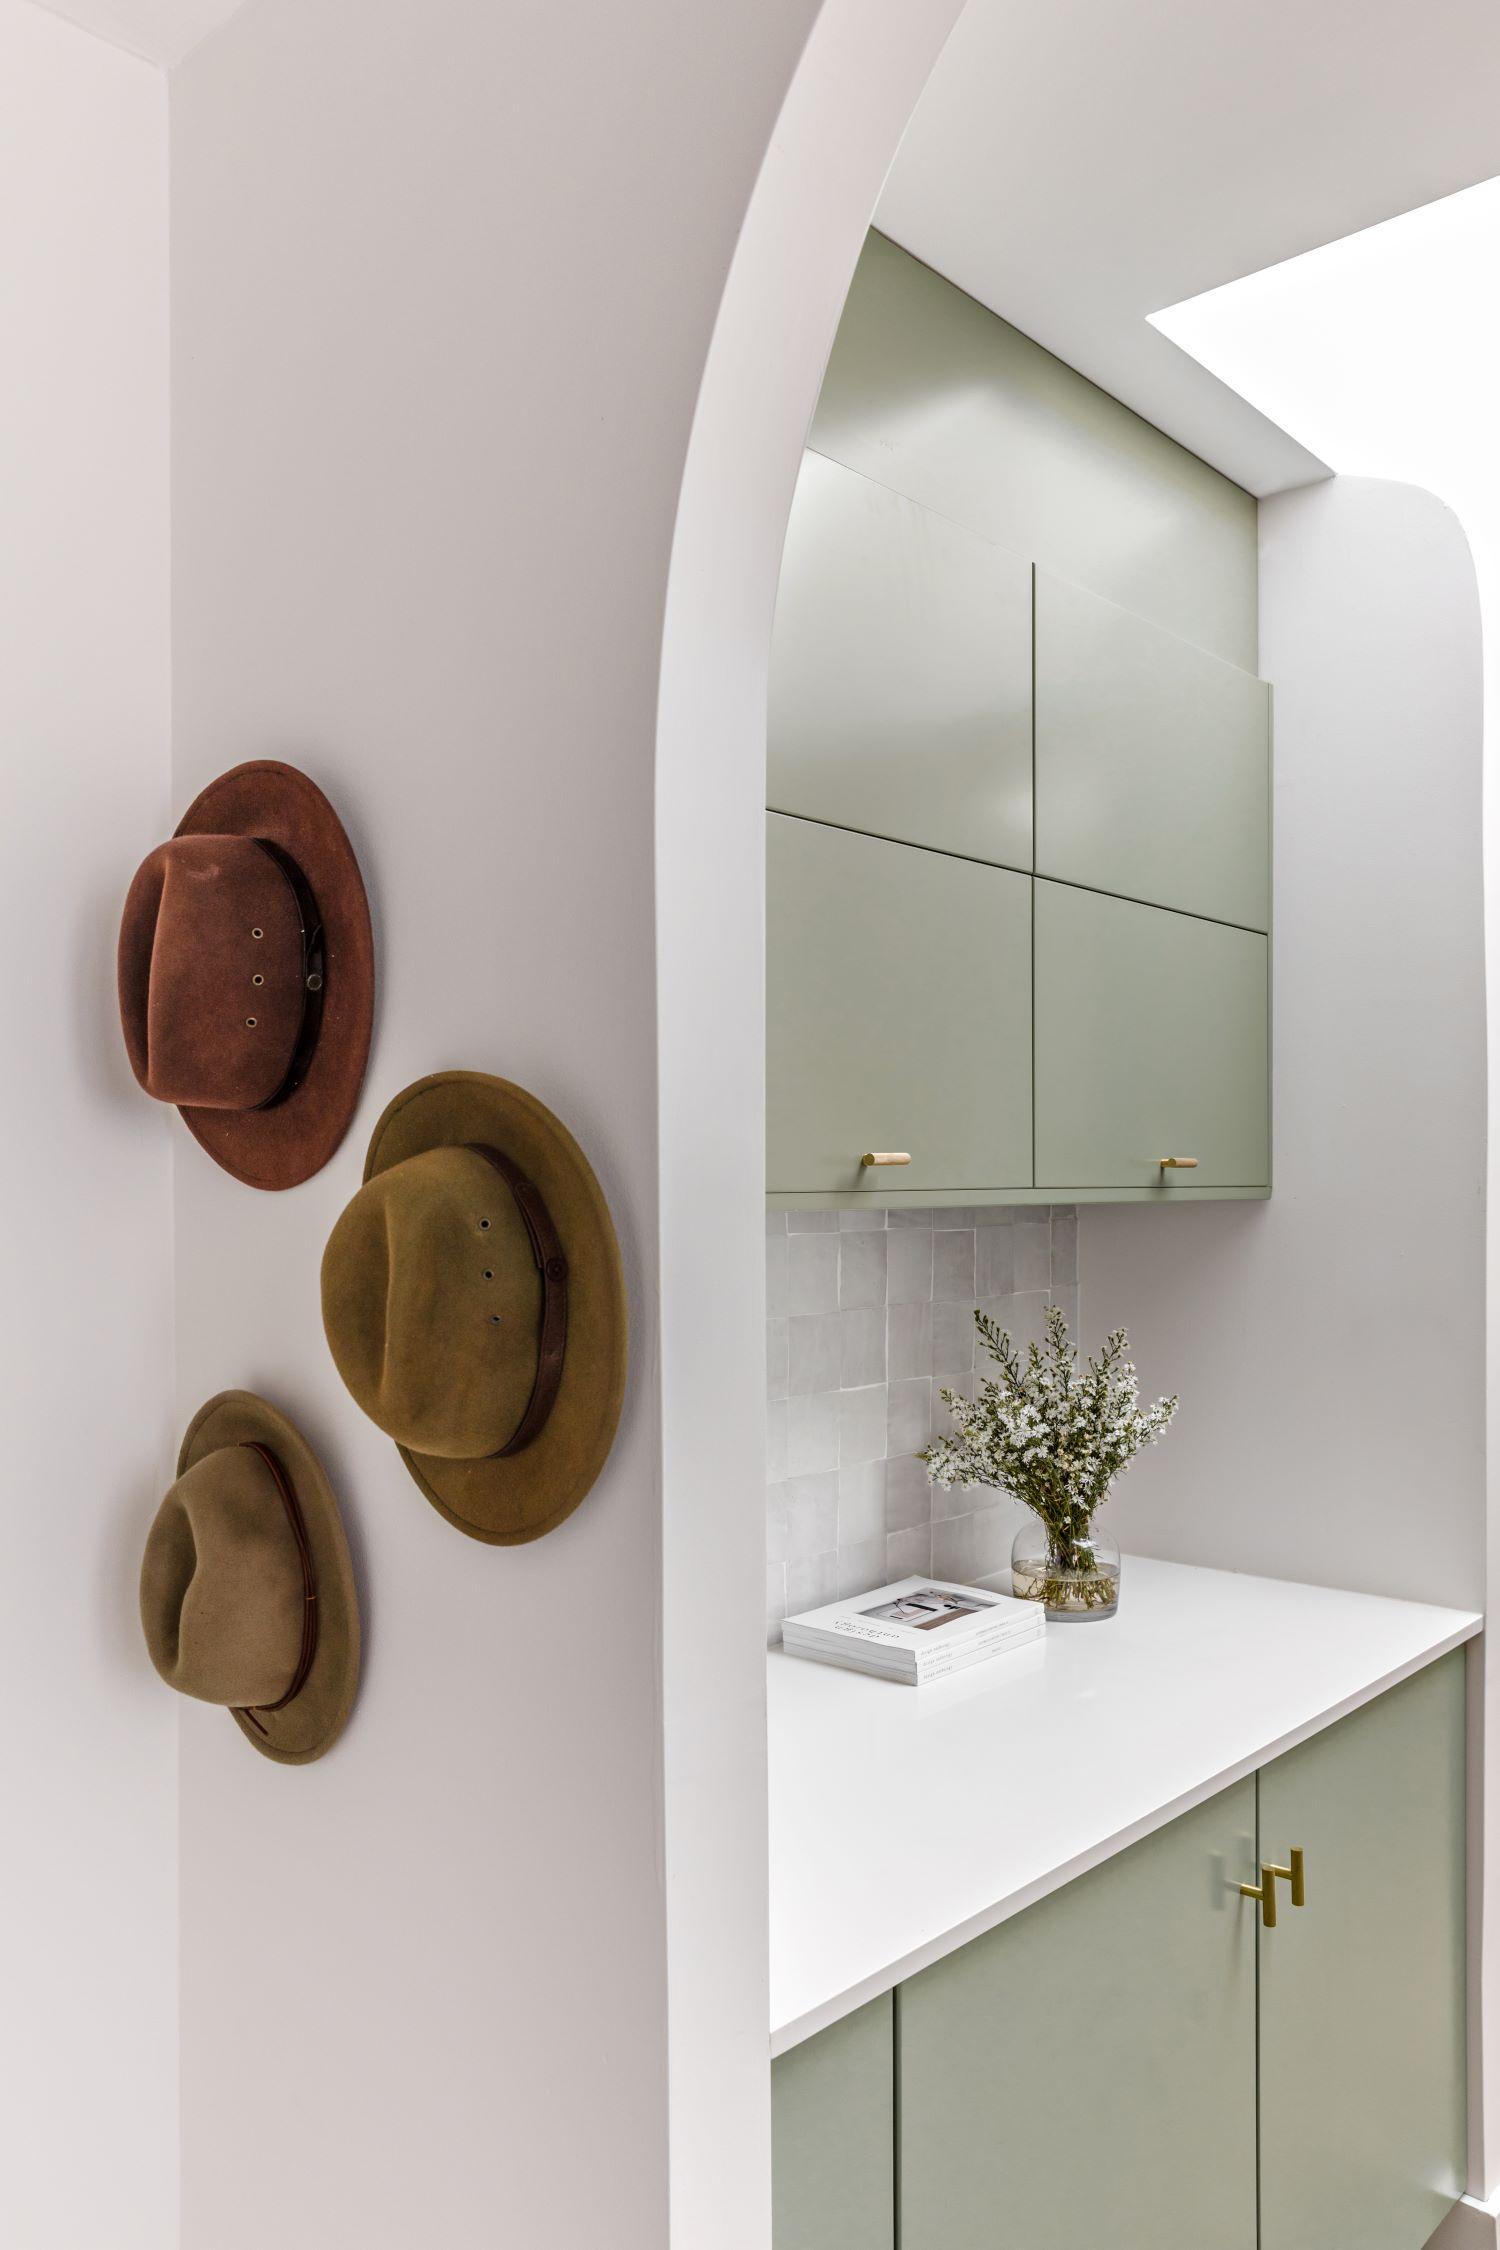 berkeley-vale-cottage-ama-studio-interiors-renovation-hat-rack-hooks